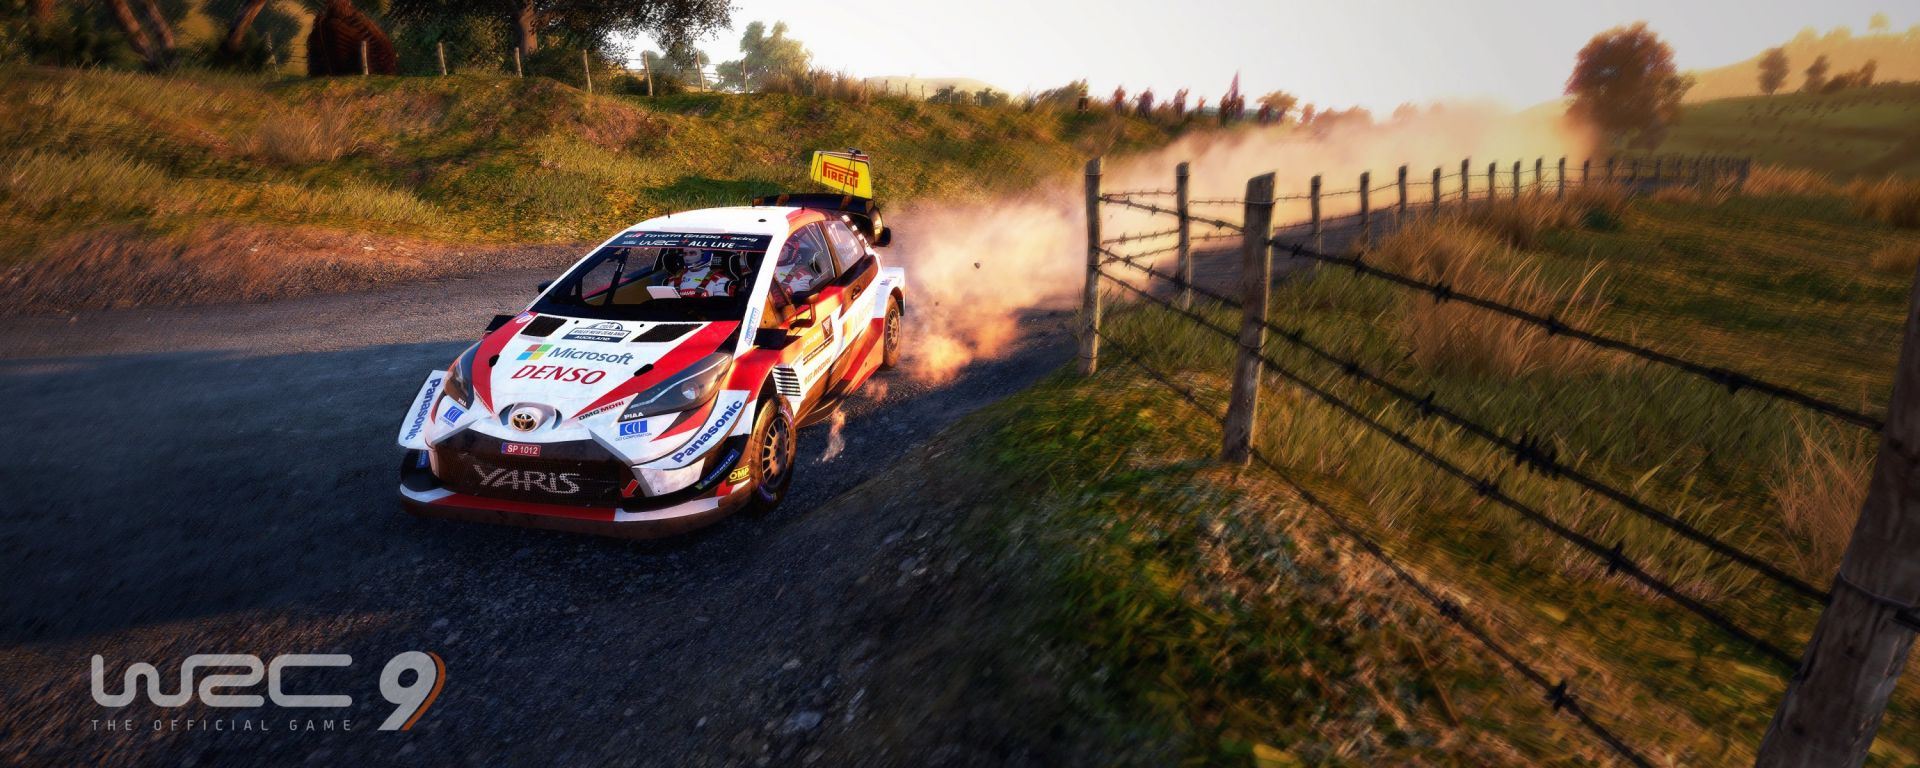 WRC 9: la Toyota impegnata in Nuova Zelanda